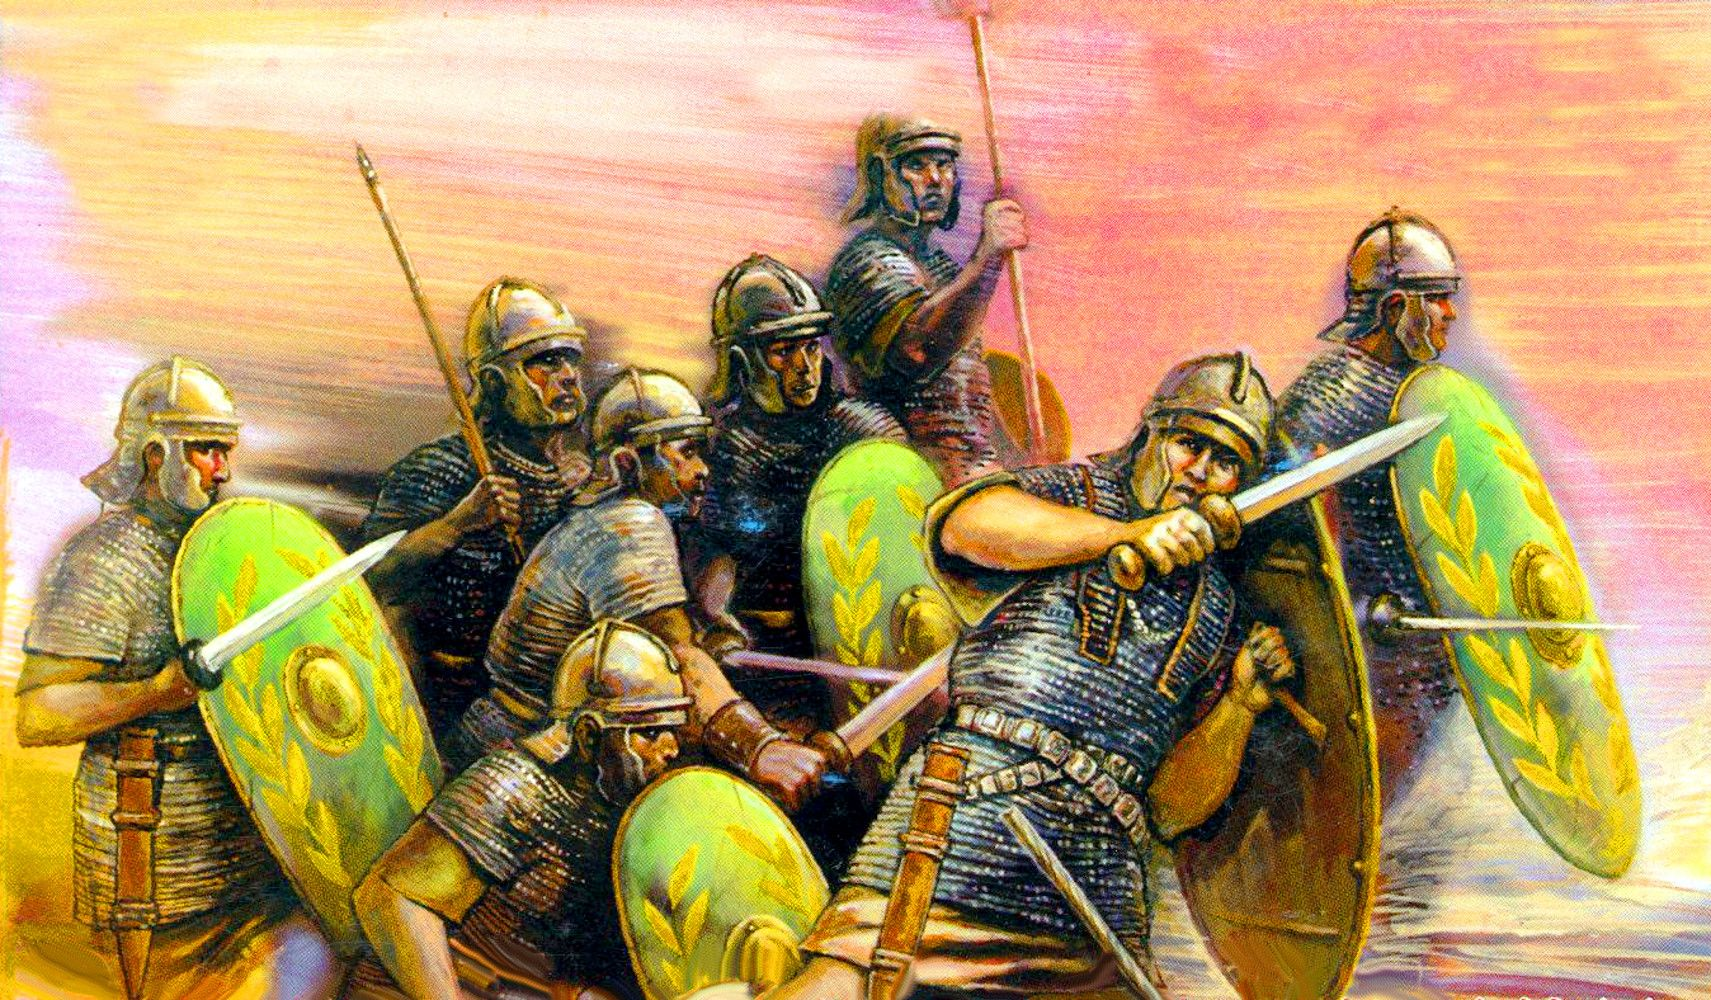 Roman Auxiliaries advancing into battle